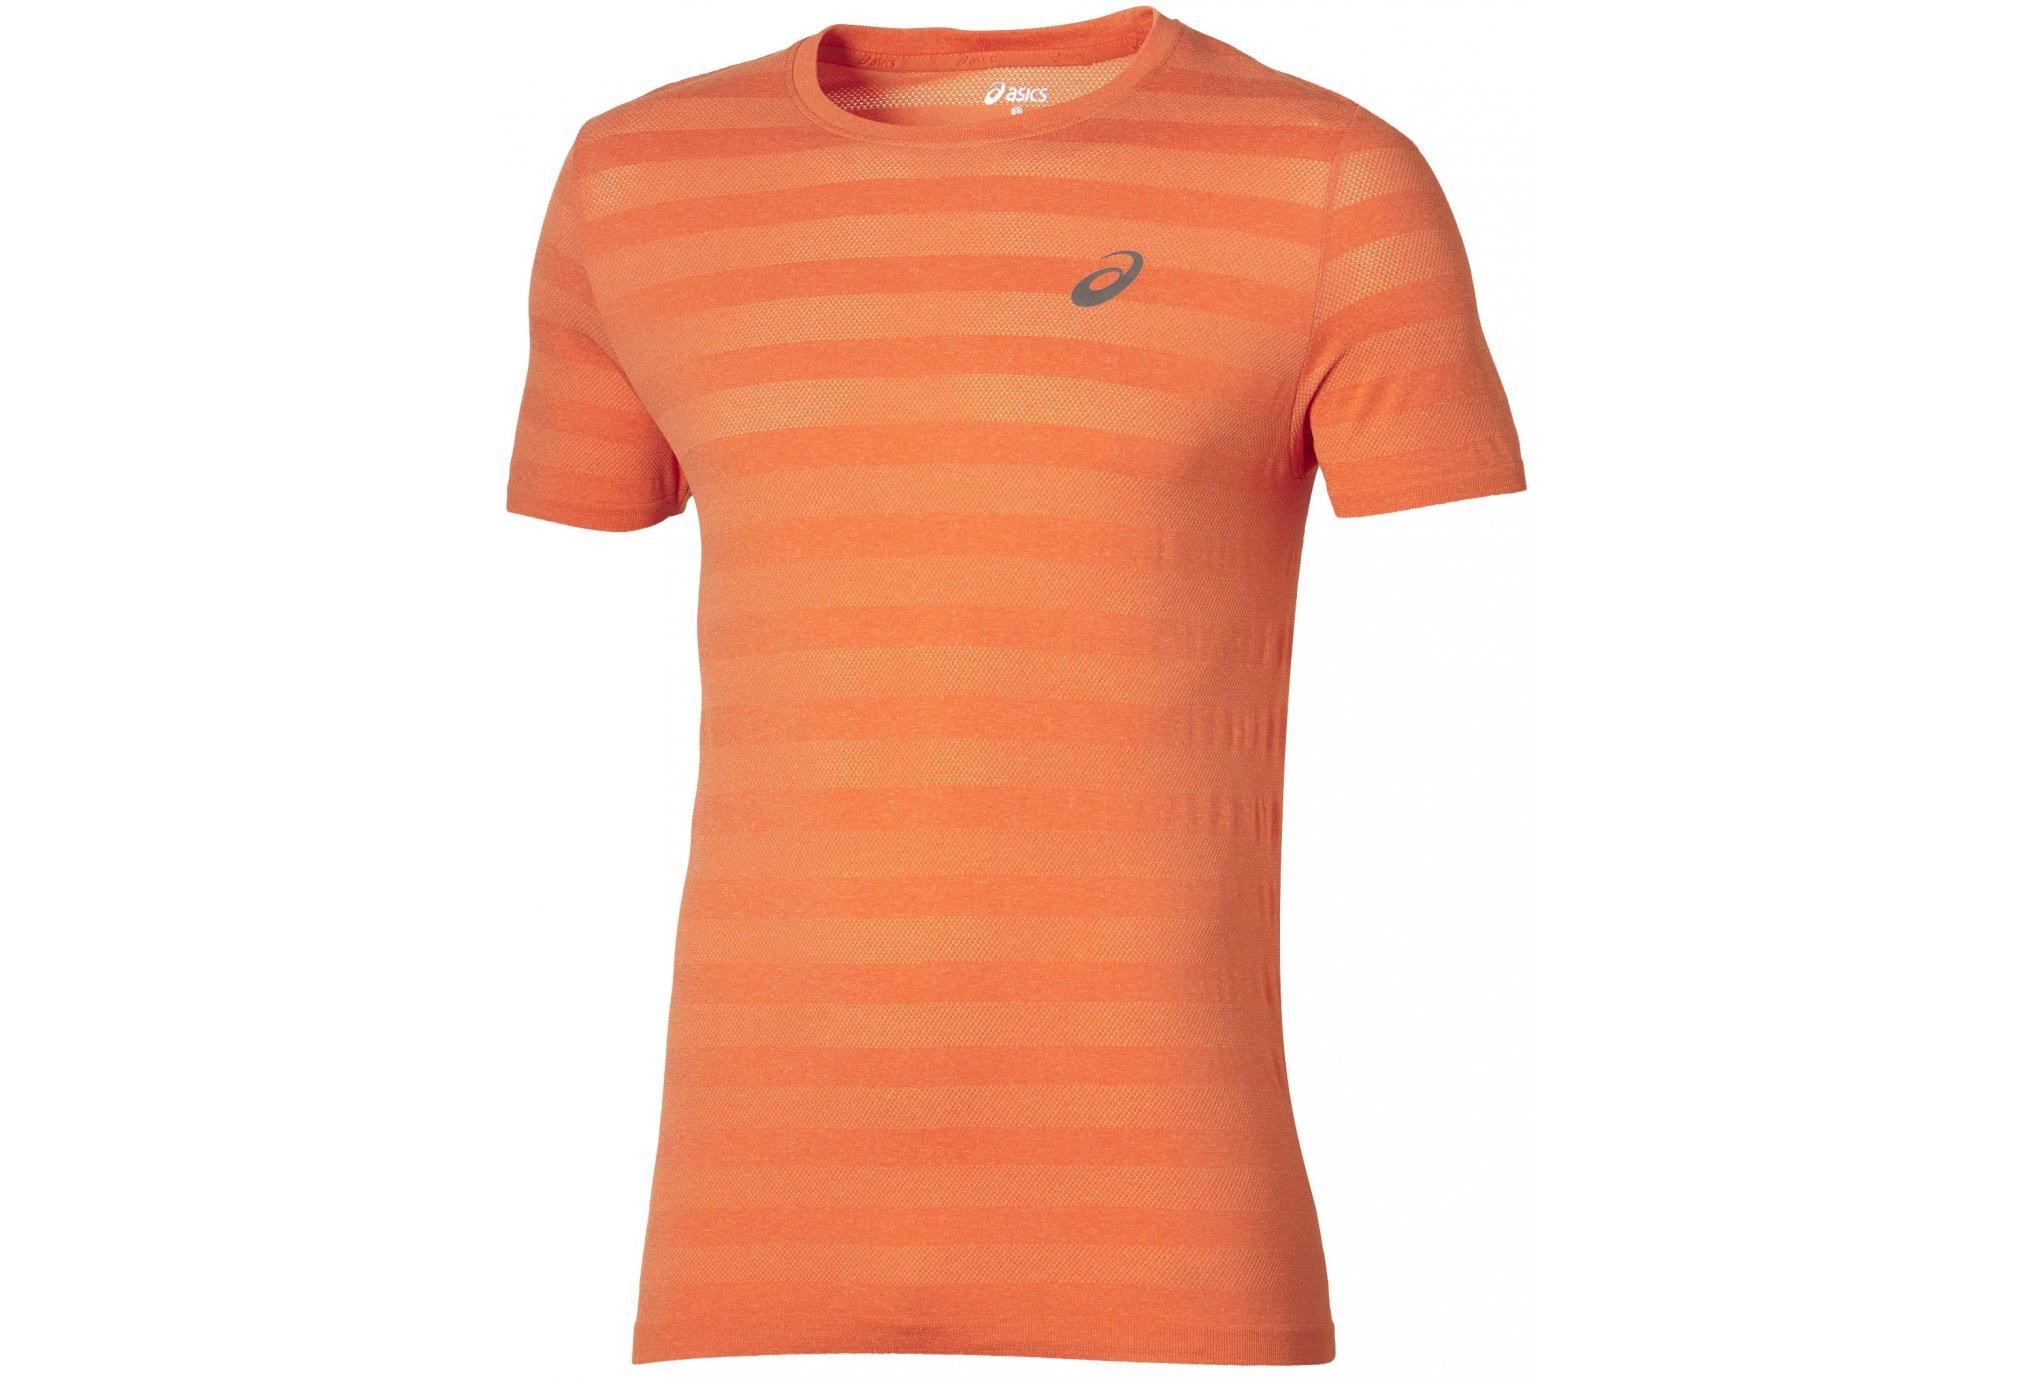 Asics Tee-Shirt FuzeX Seamless M Diététique Vêtements homme